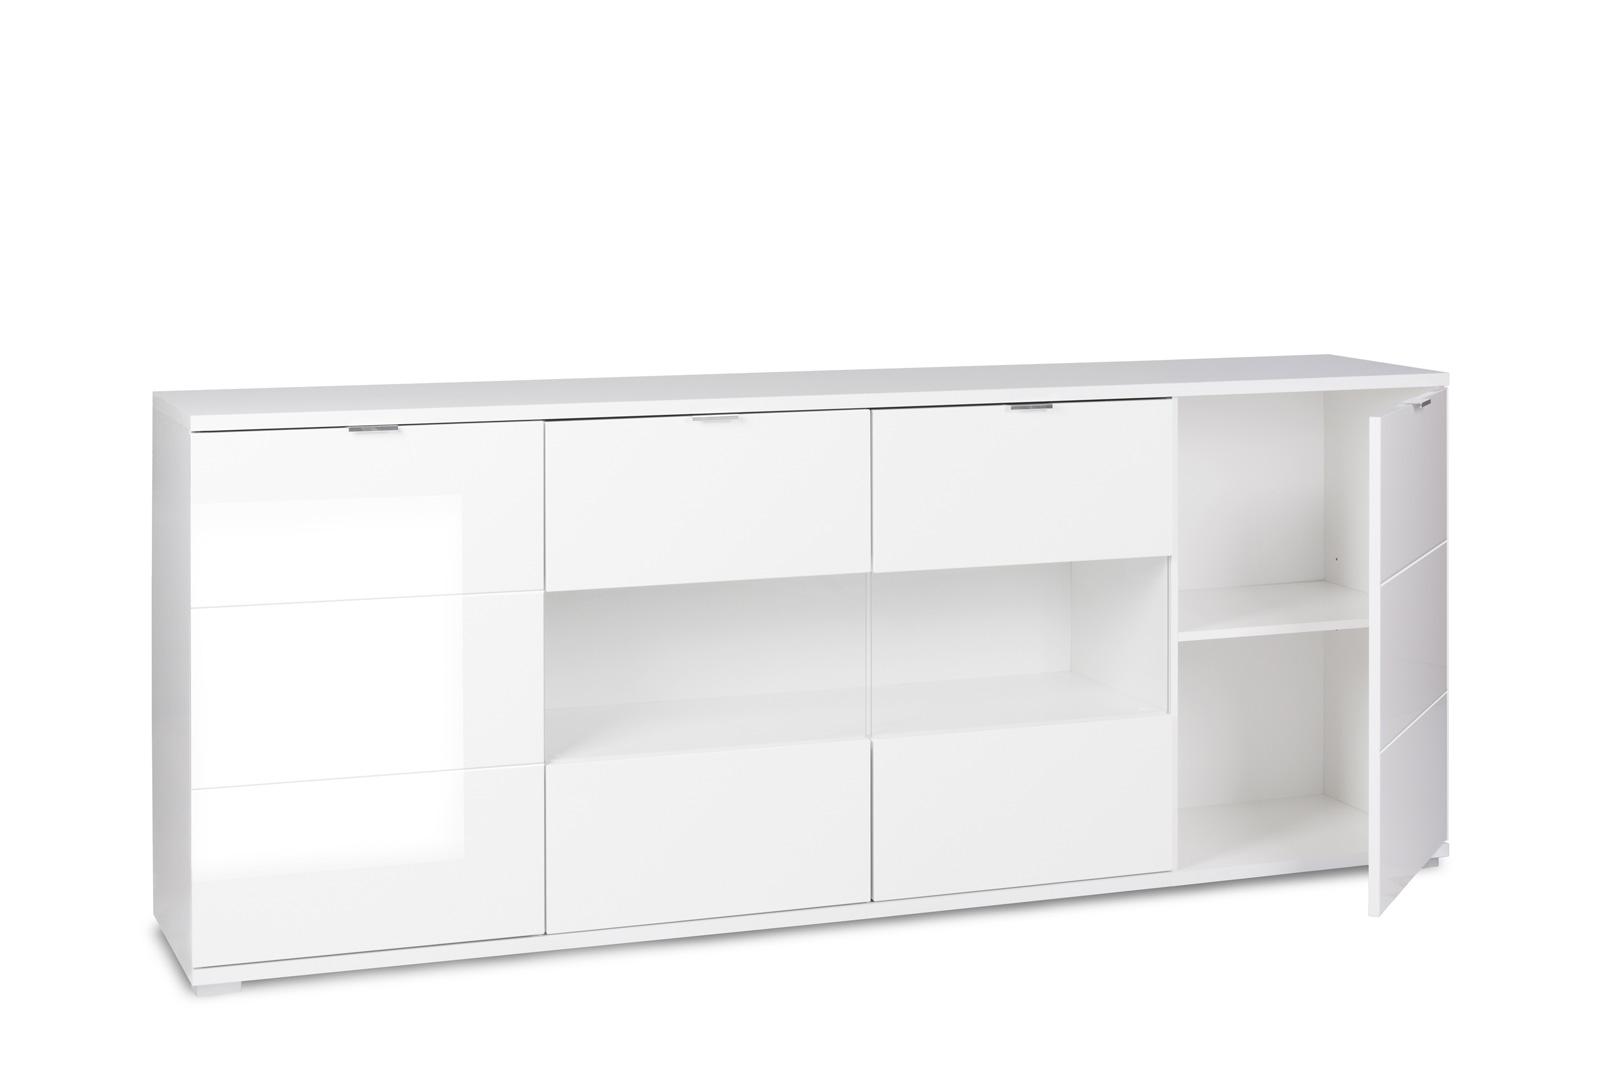 Sam sideboard holz 200 x 85 cm glossy 5 auf lager for Sideboard 200 cm holz